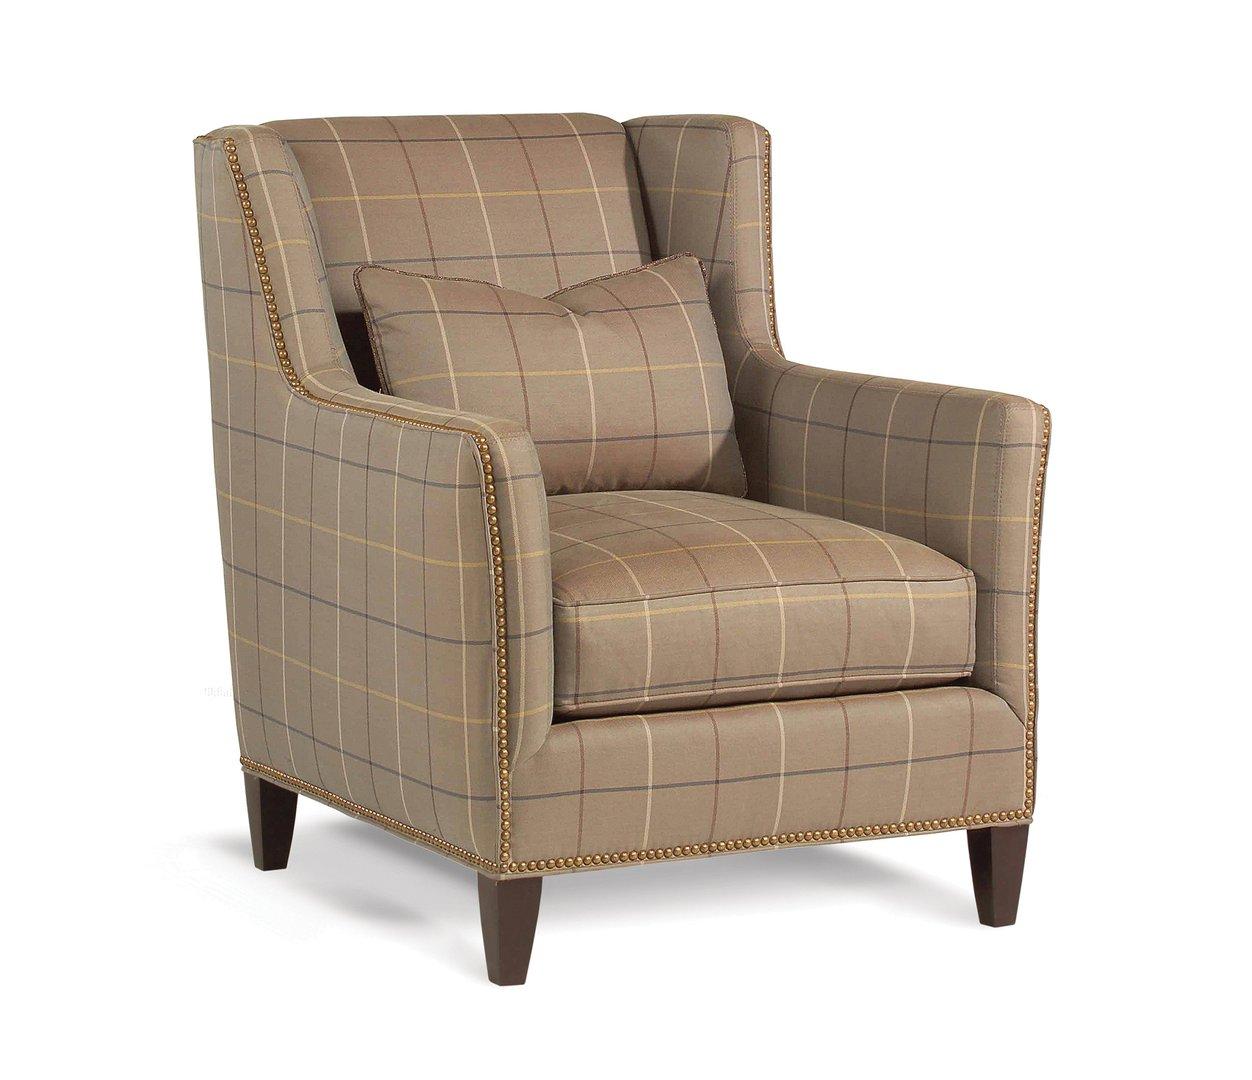 Rowley chair Image